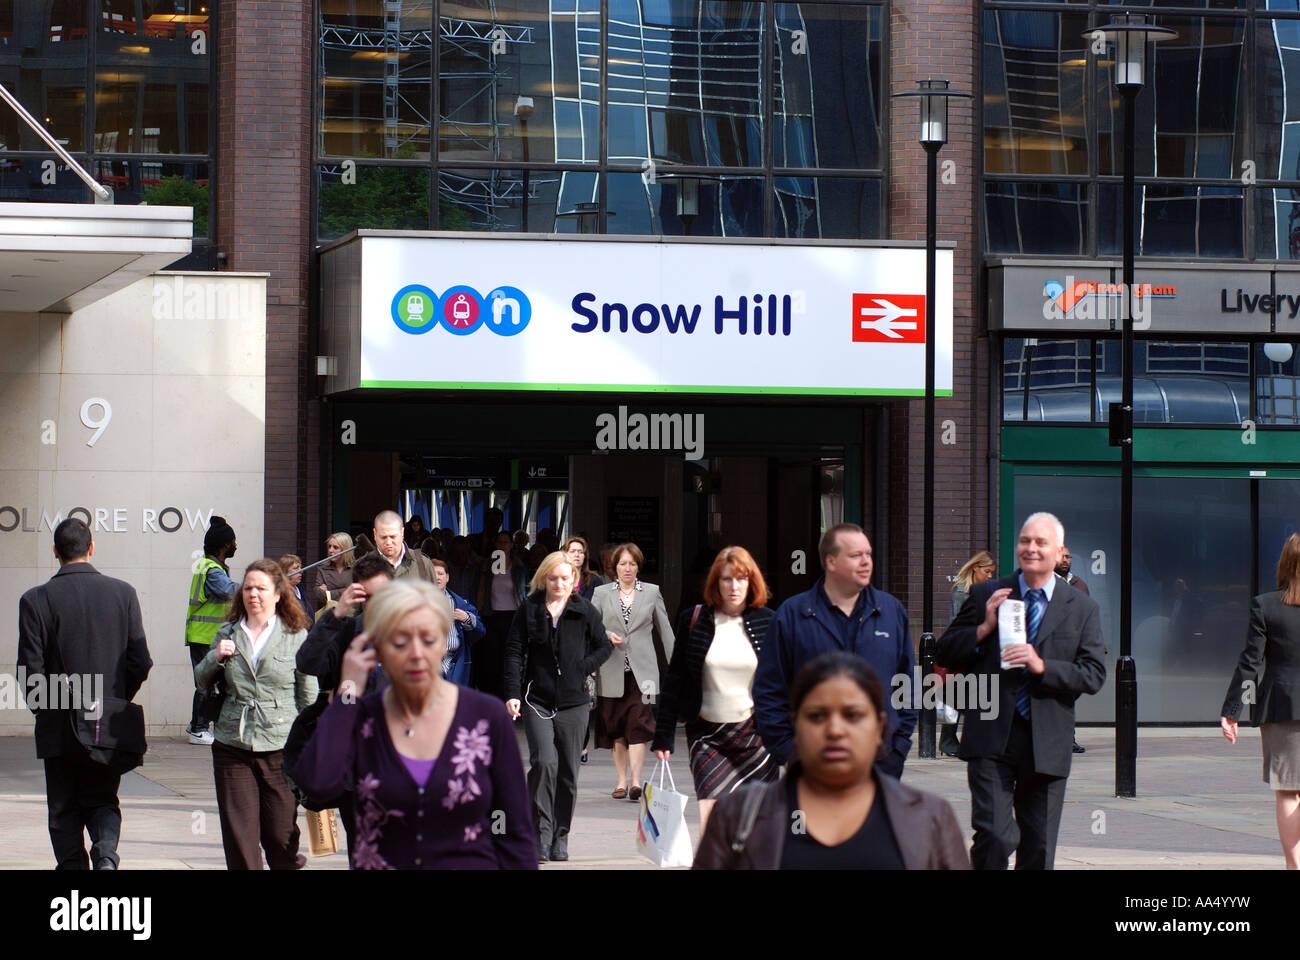 Morning commuters leaving Snow Hill railway station, Birmingham, West Midlands, England, UK Stock Photo